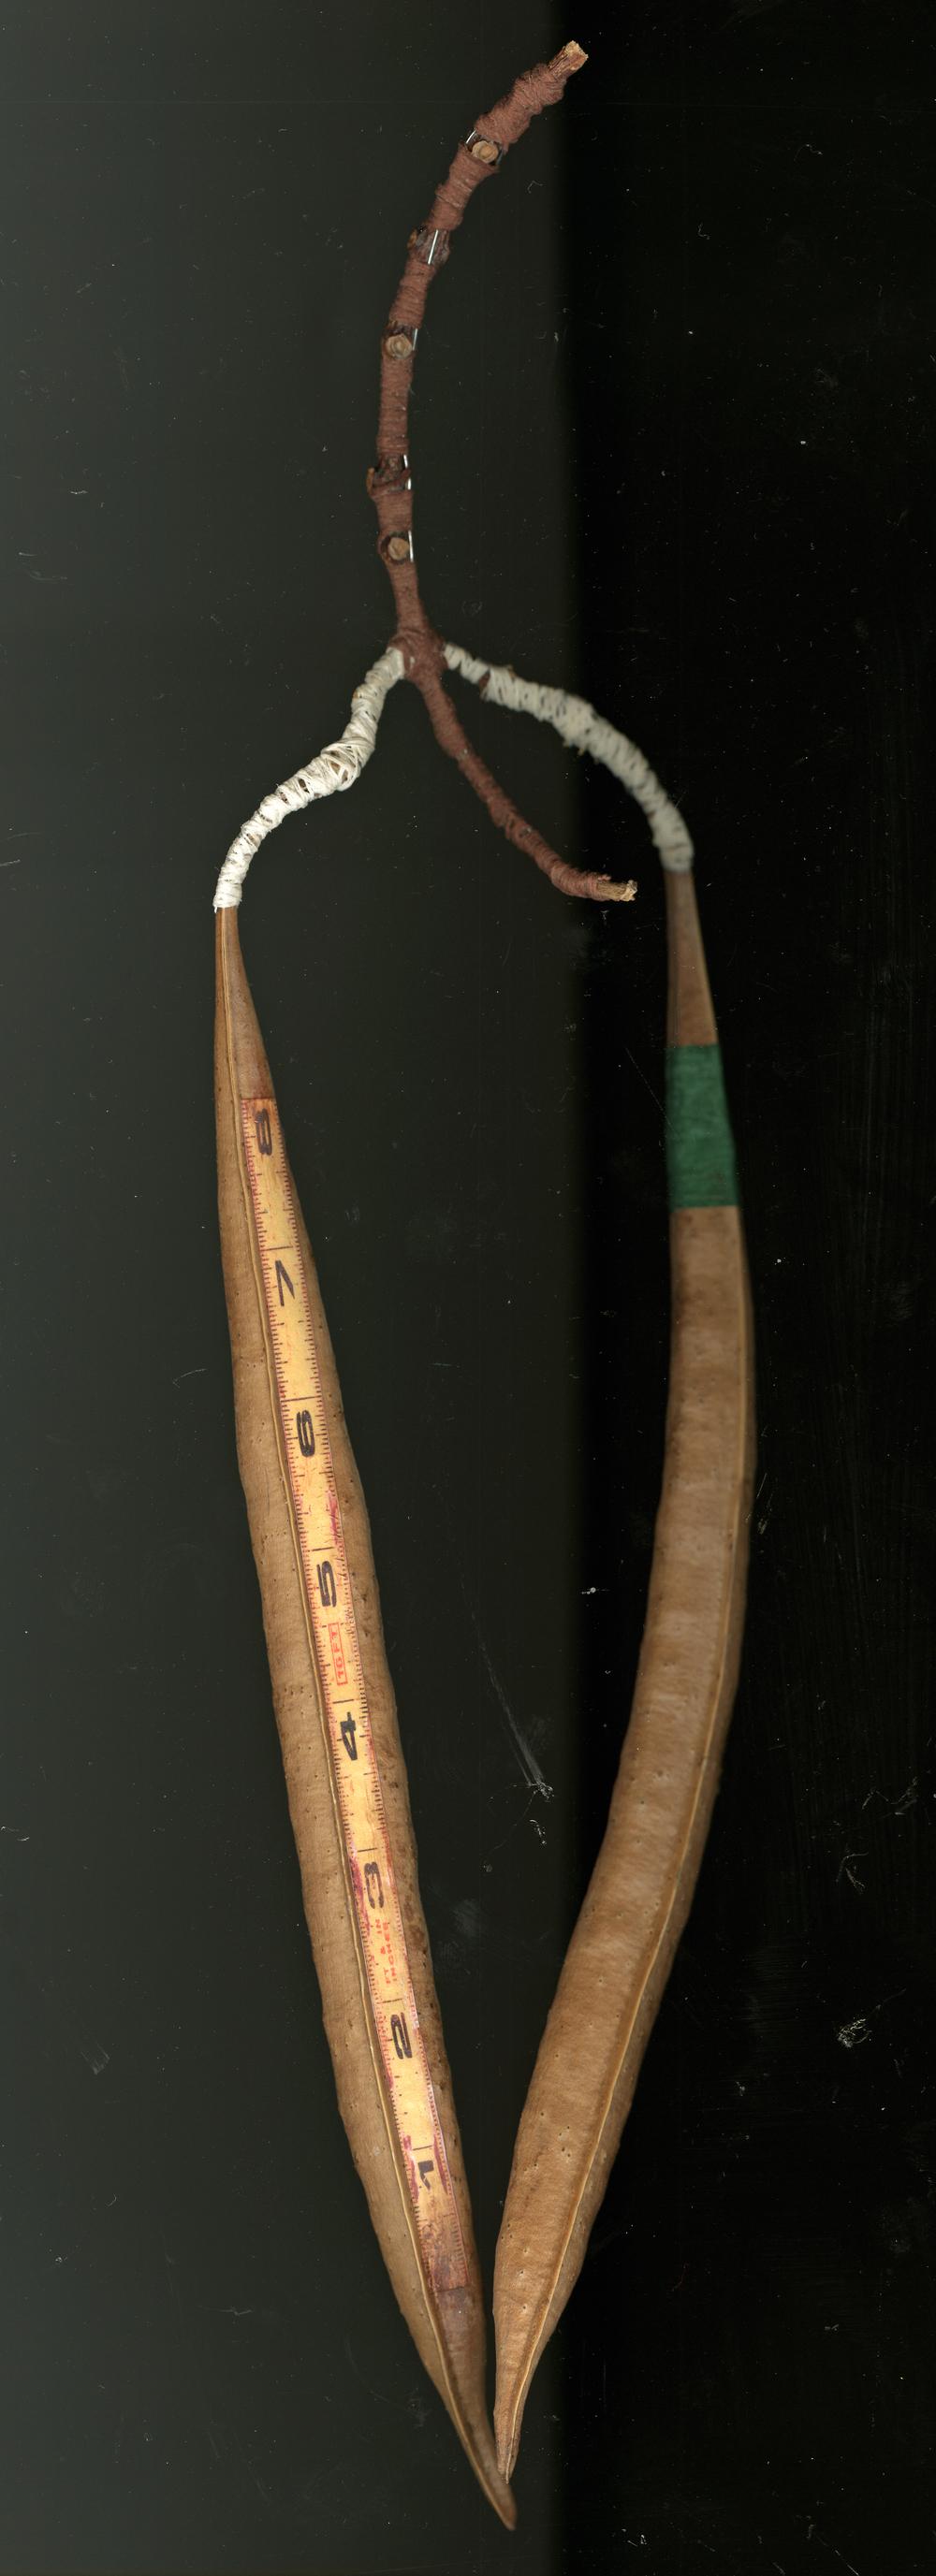 Mame monosashi (bean ruler)